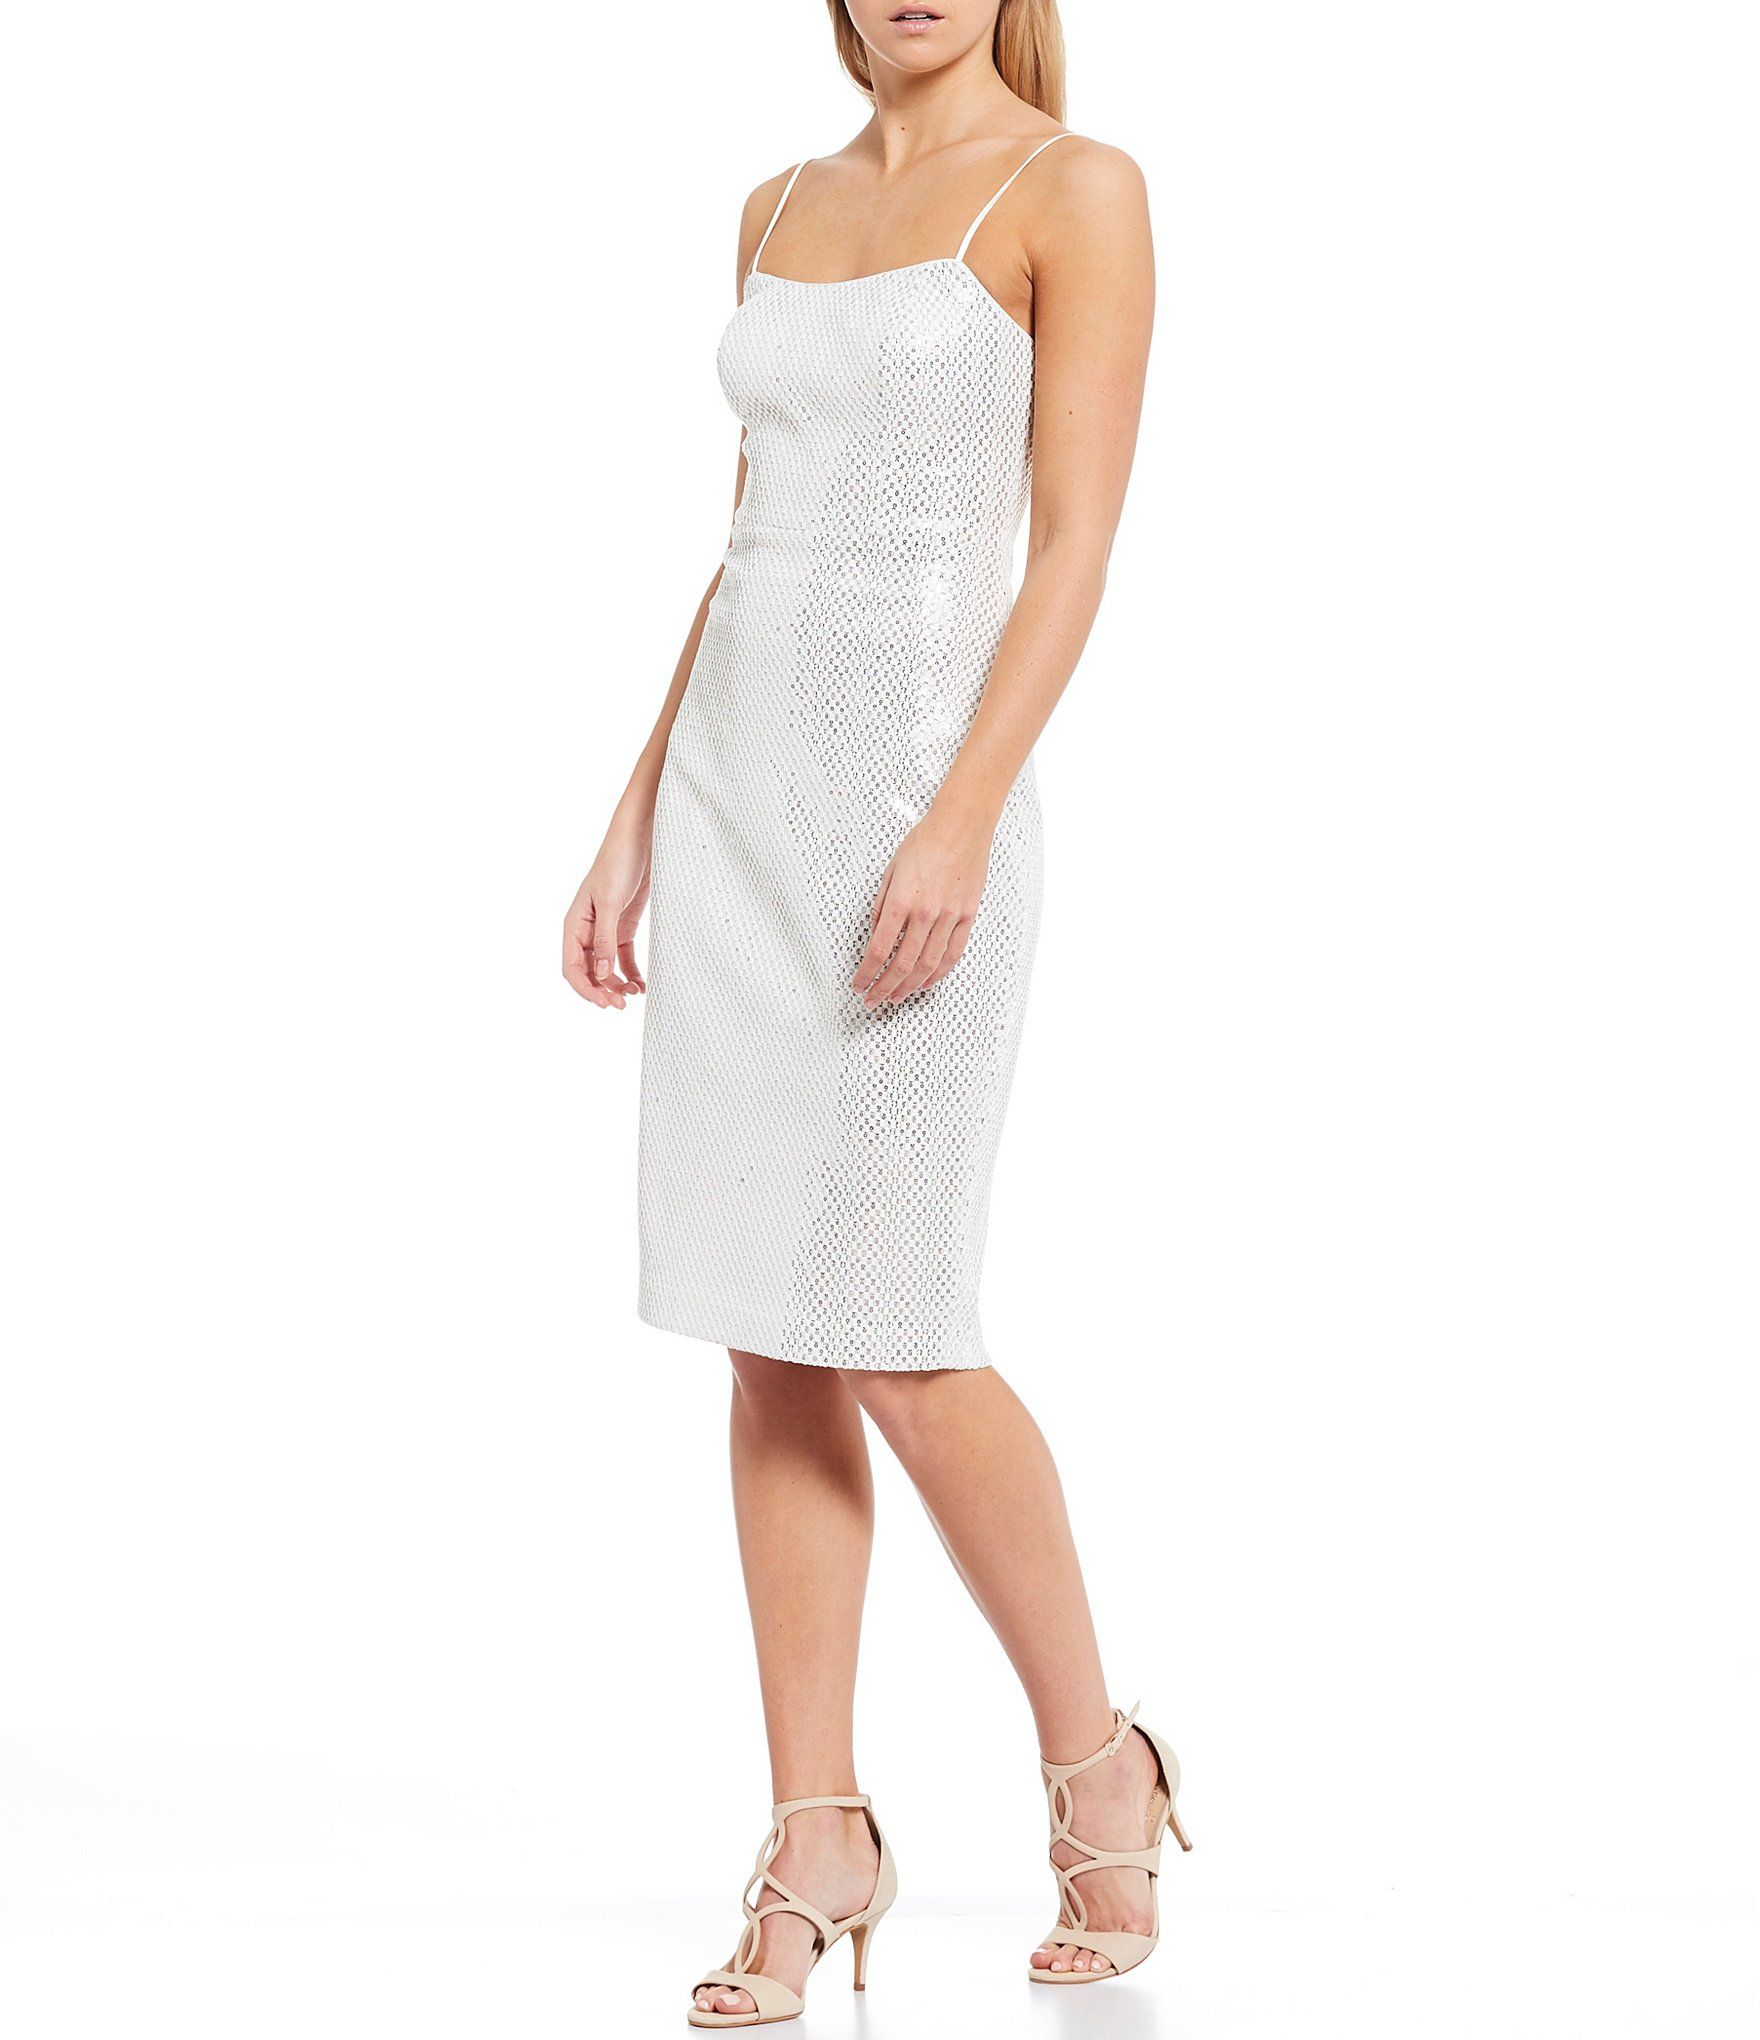 Shop For Vince Camuto Sleeveless Textured Sequin Sheath Dress At Dillard S Visit Dillard S T Metallic Cocktail Dresses Casual Work Dresses Sequin Sheath Dress [ 2040 x 1760 Pixel ]